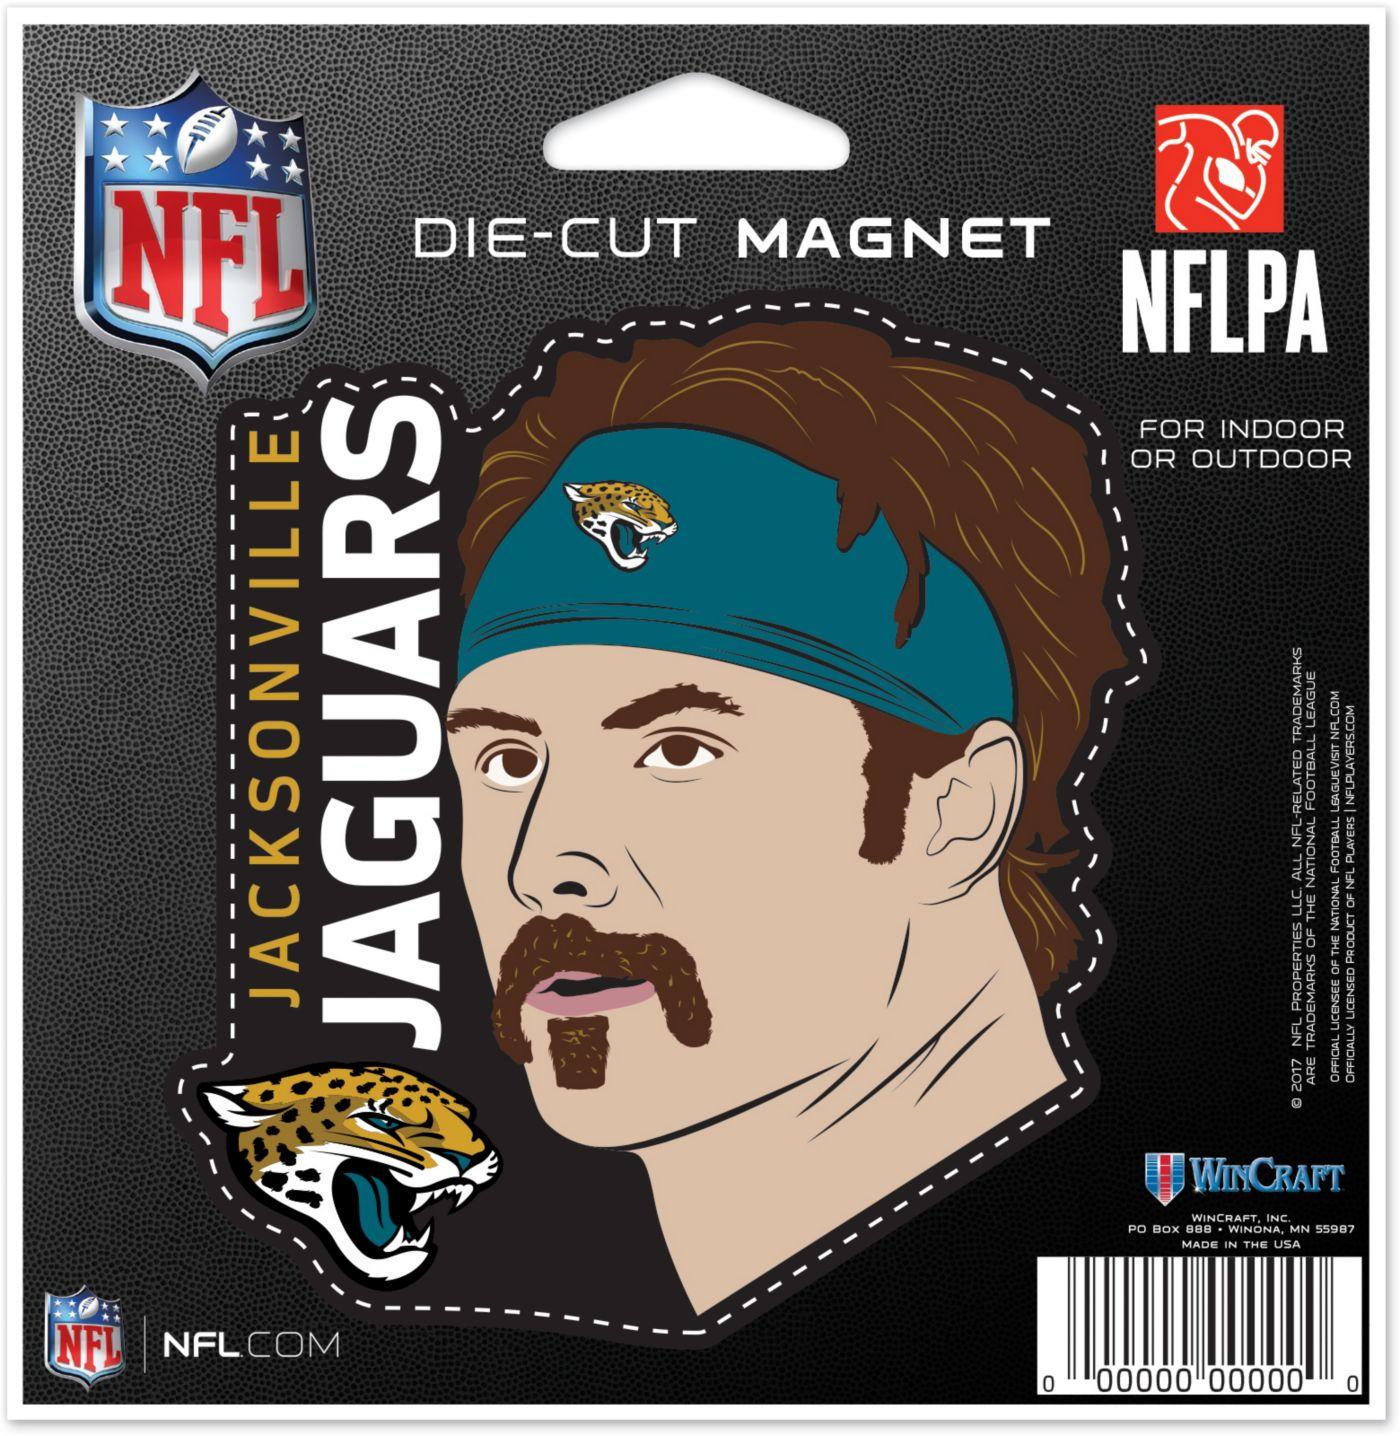 WinCraft Jacksonville Jaguars Gardner Minshew Die-Cut Magnet